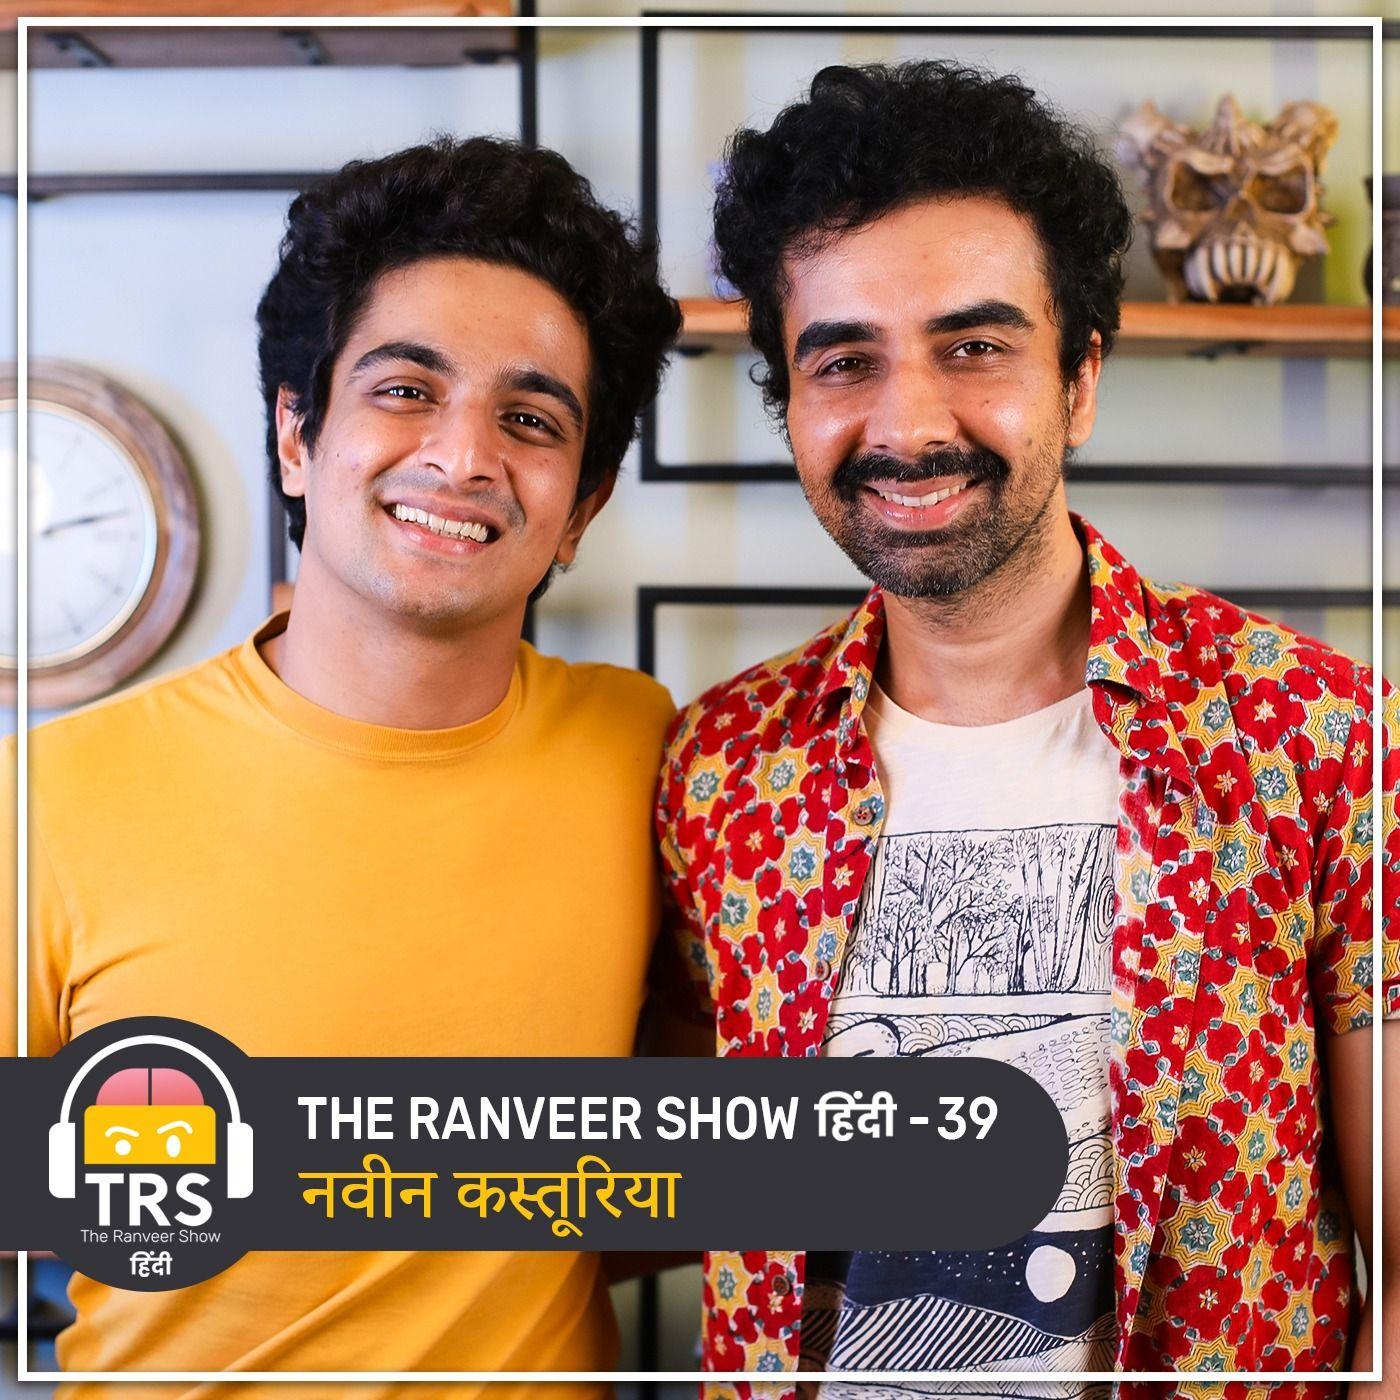 From TVF Pitchers To Aspirants - Naveen Kasturia's Inspiring Story | The Ranveer Show हिंदी 39